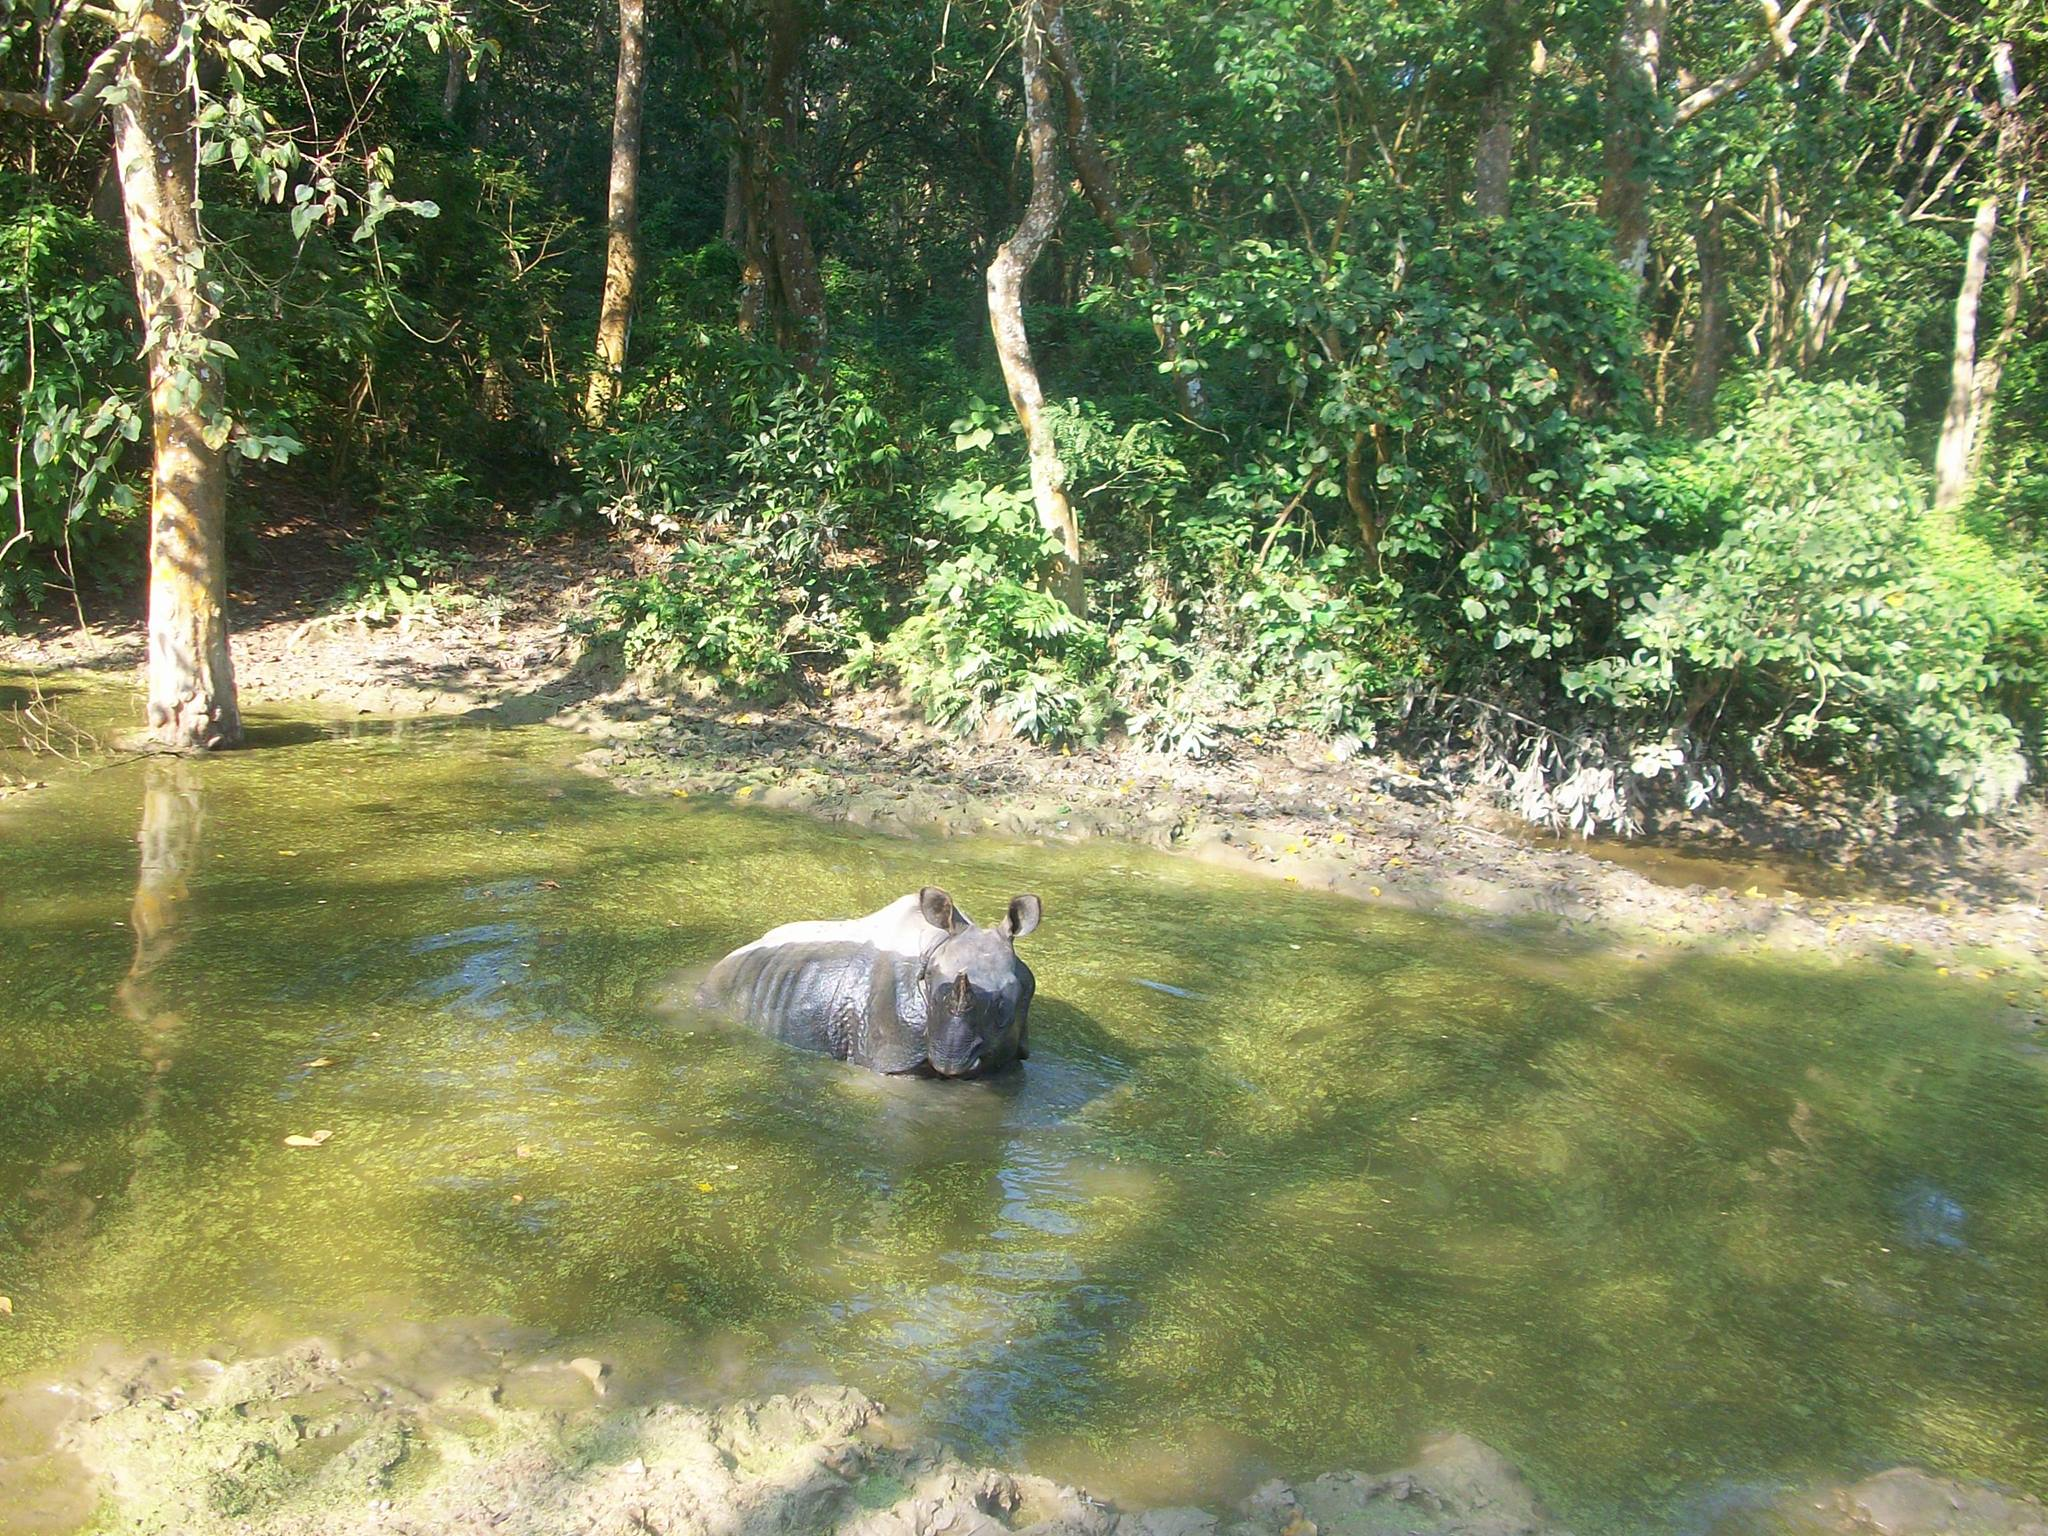 File:Asian Elephant Safari in Chitwan National Park, Chitwan